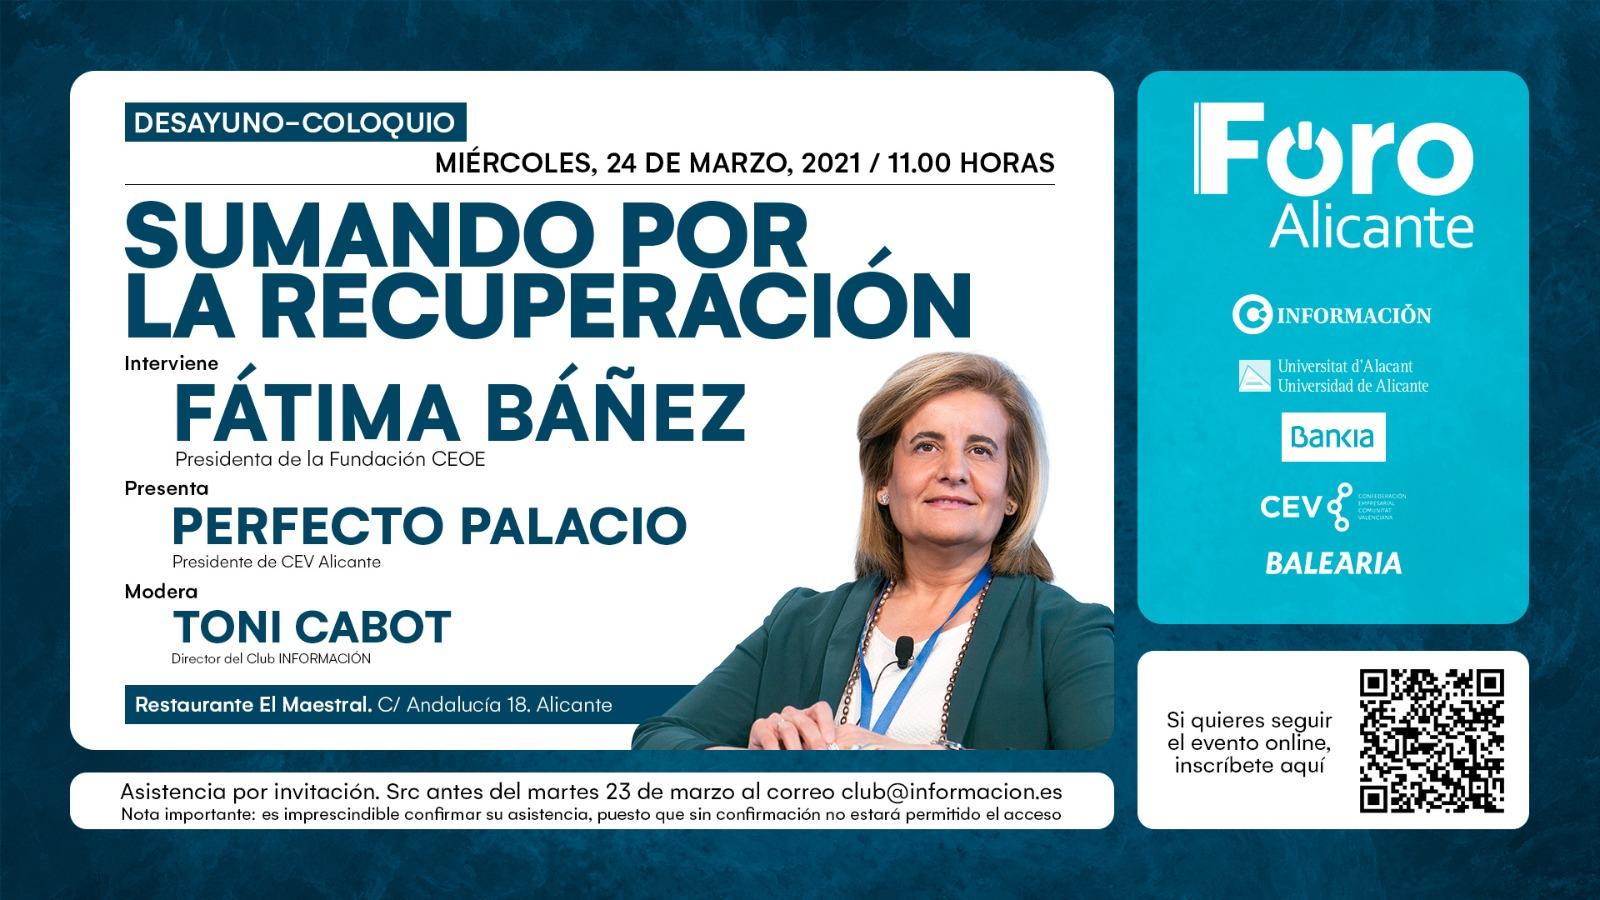 FORO ALICANTE con FÁTIMA BÁÑEZ